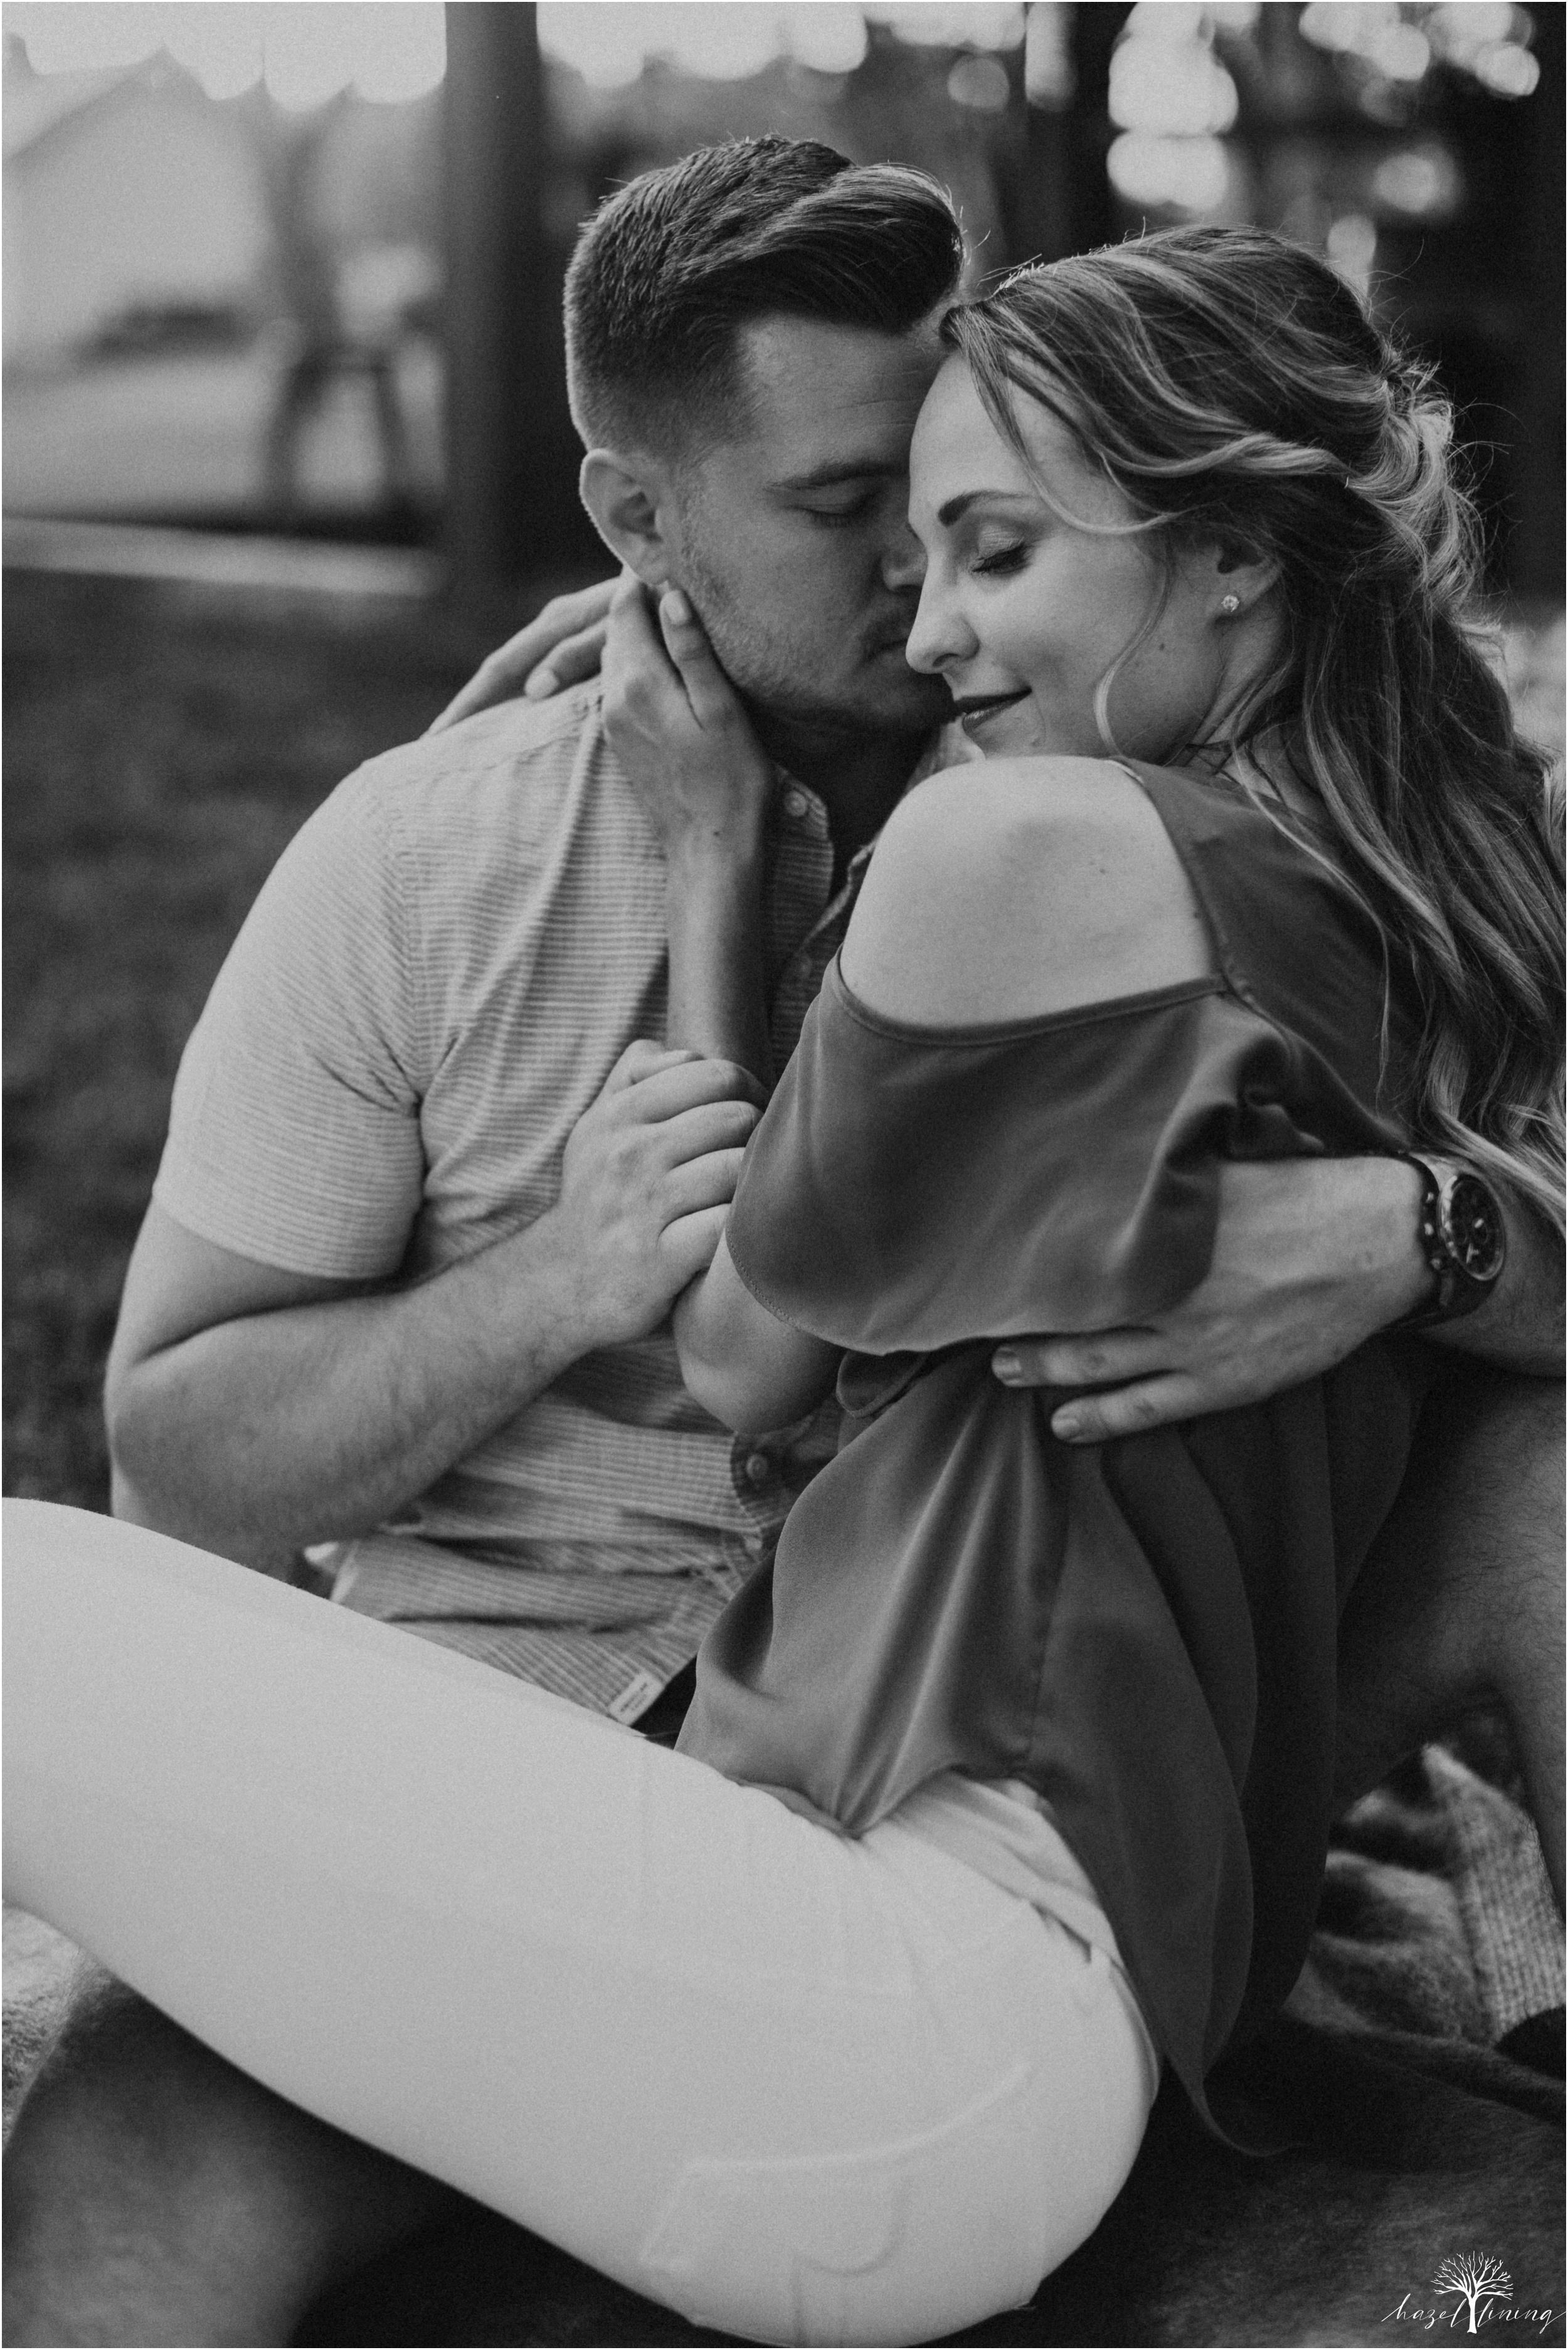 rachel-warner-chris-niedrist-the-farm-bakery-and-events-quakertown-pa-summer-engagement-hazel-lining-photography-destination-elopement-wedding-engagement-photography_0072.jpg